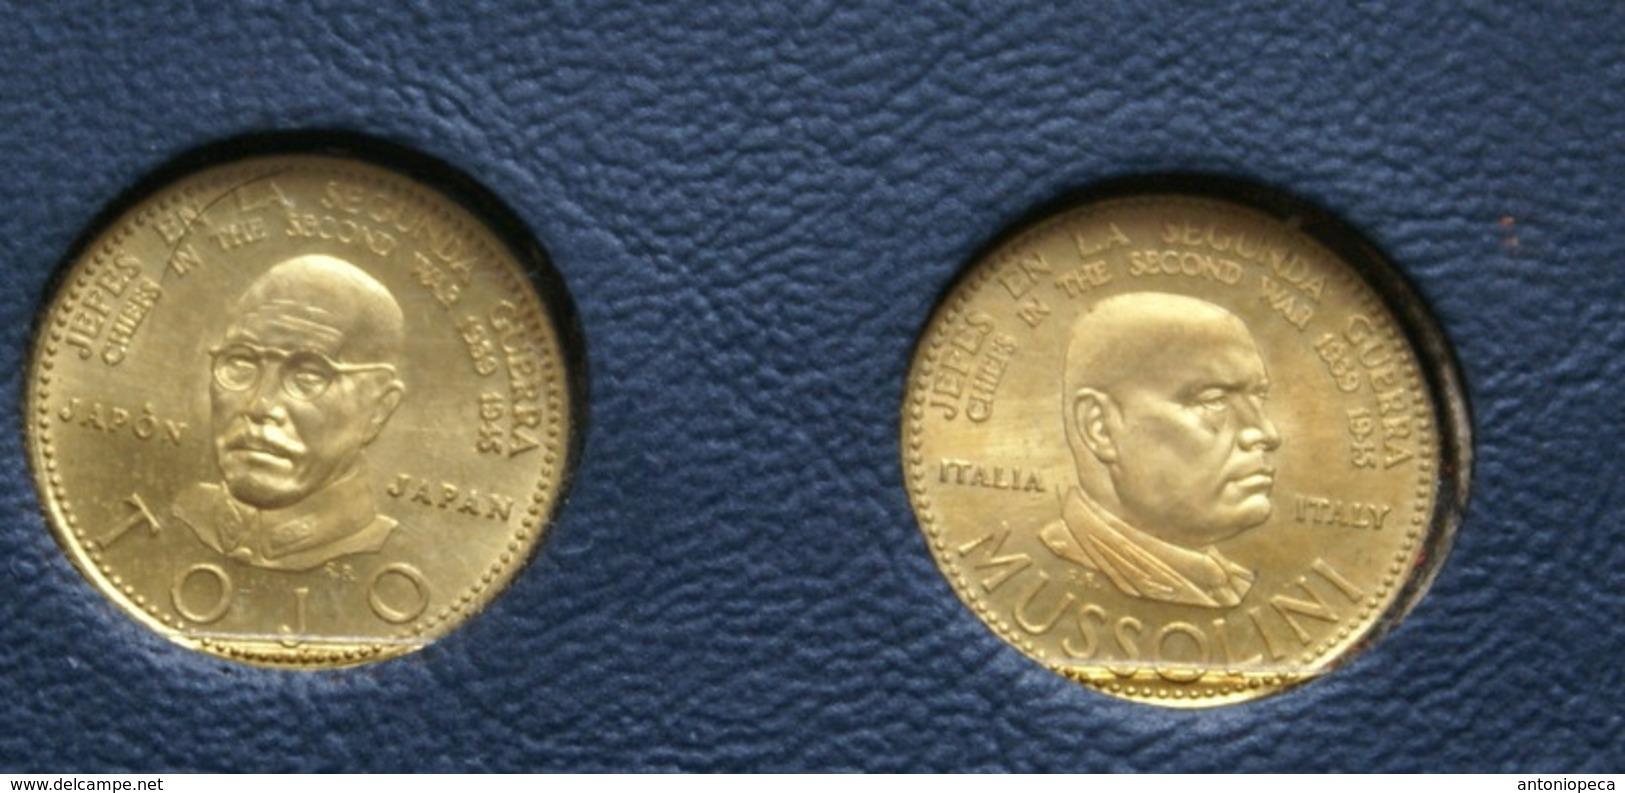 "COLLEZIONE MONETE D'ORO "" JEFES EN LA SEGUNDA GUERRA 1939-1945"" - Altri Paesi"